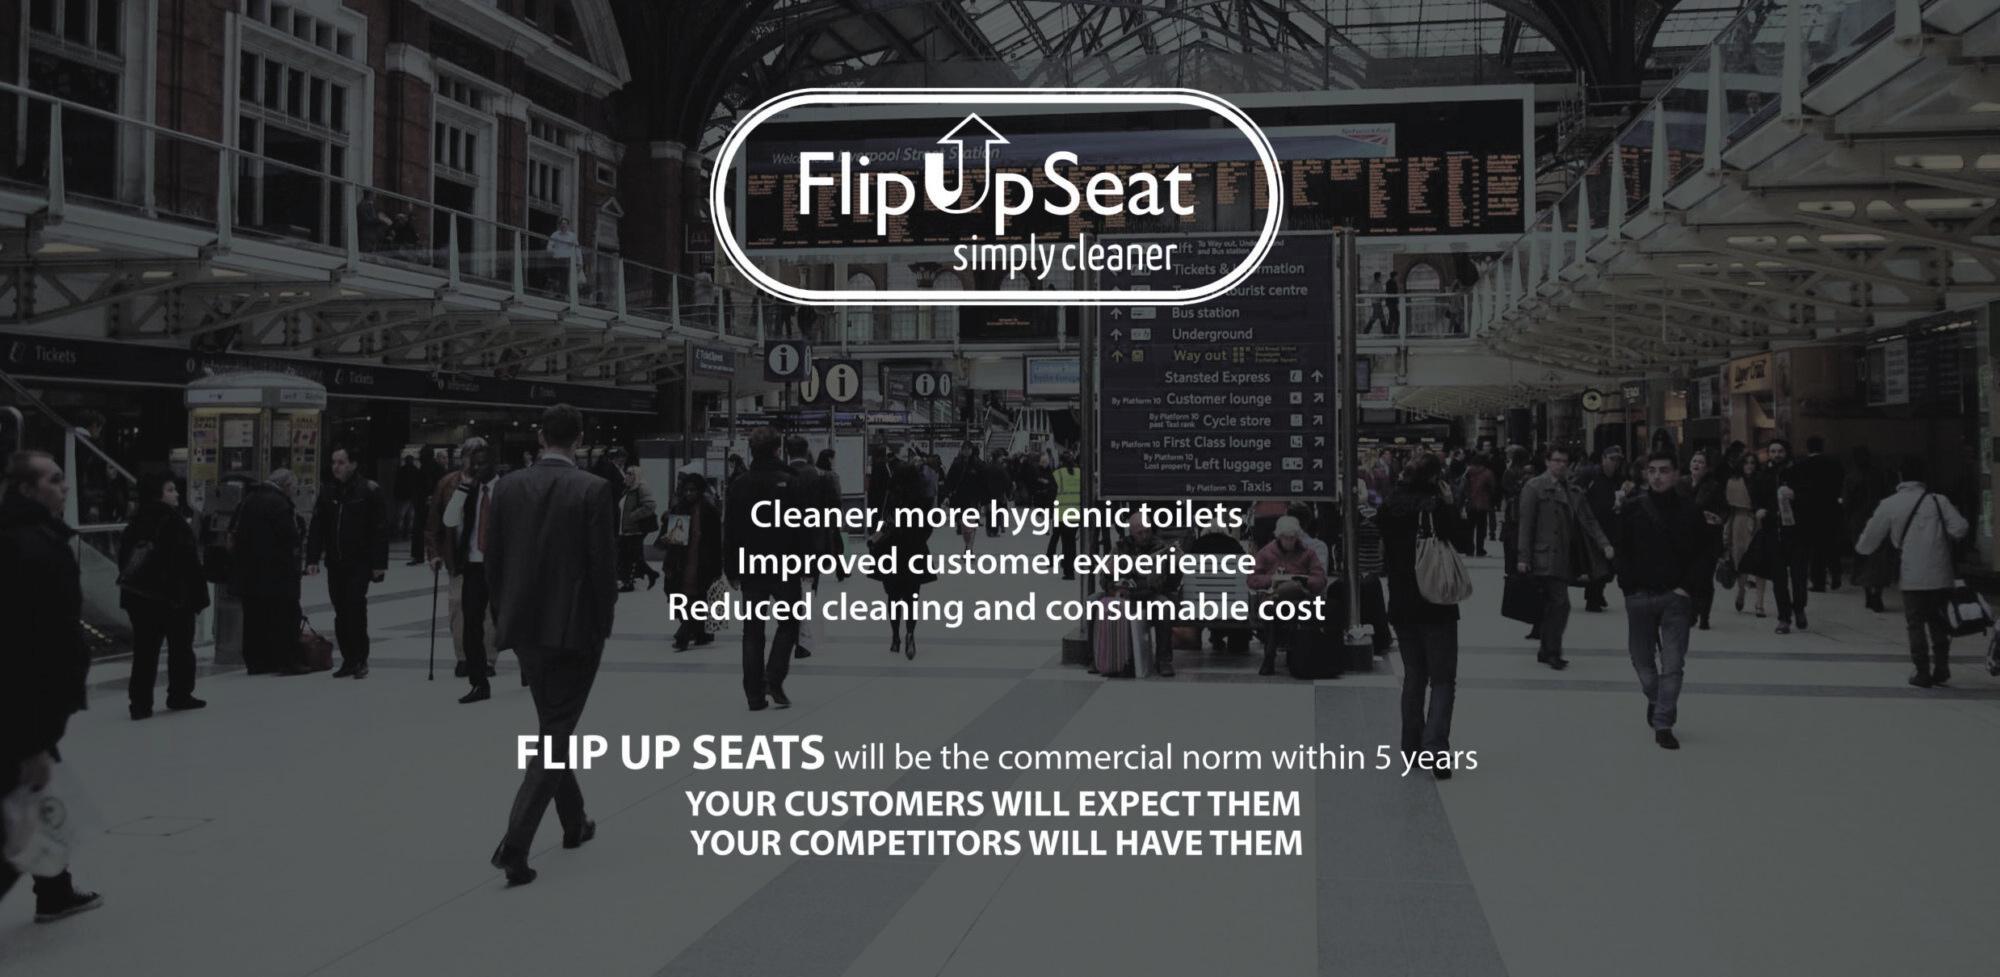 FlipUp Seat